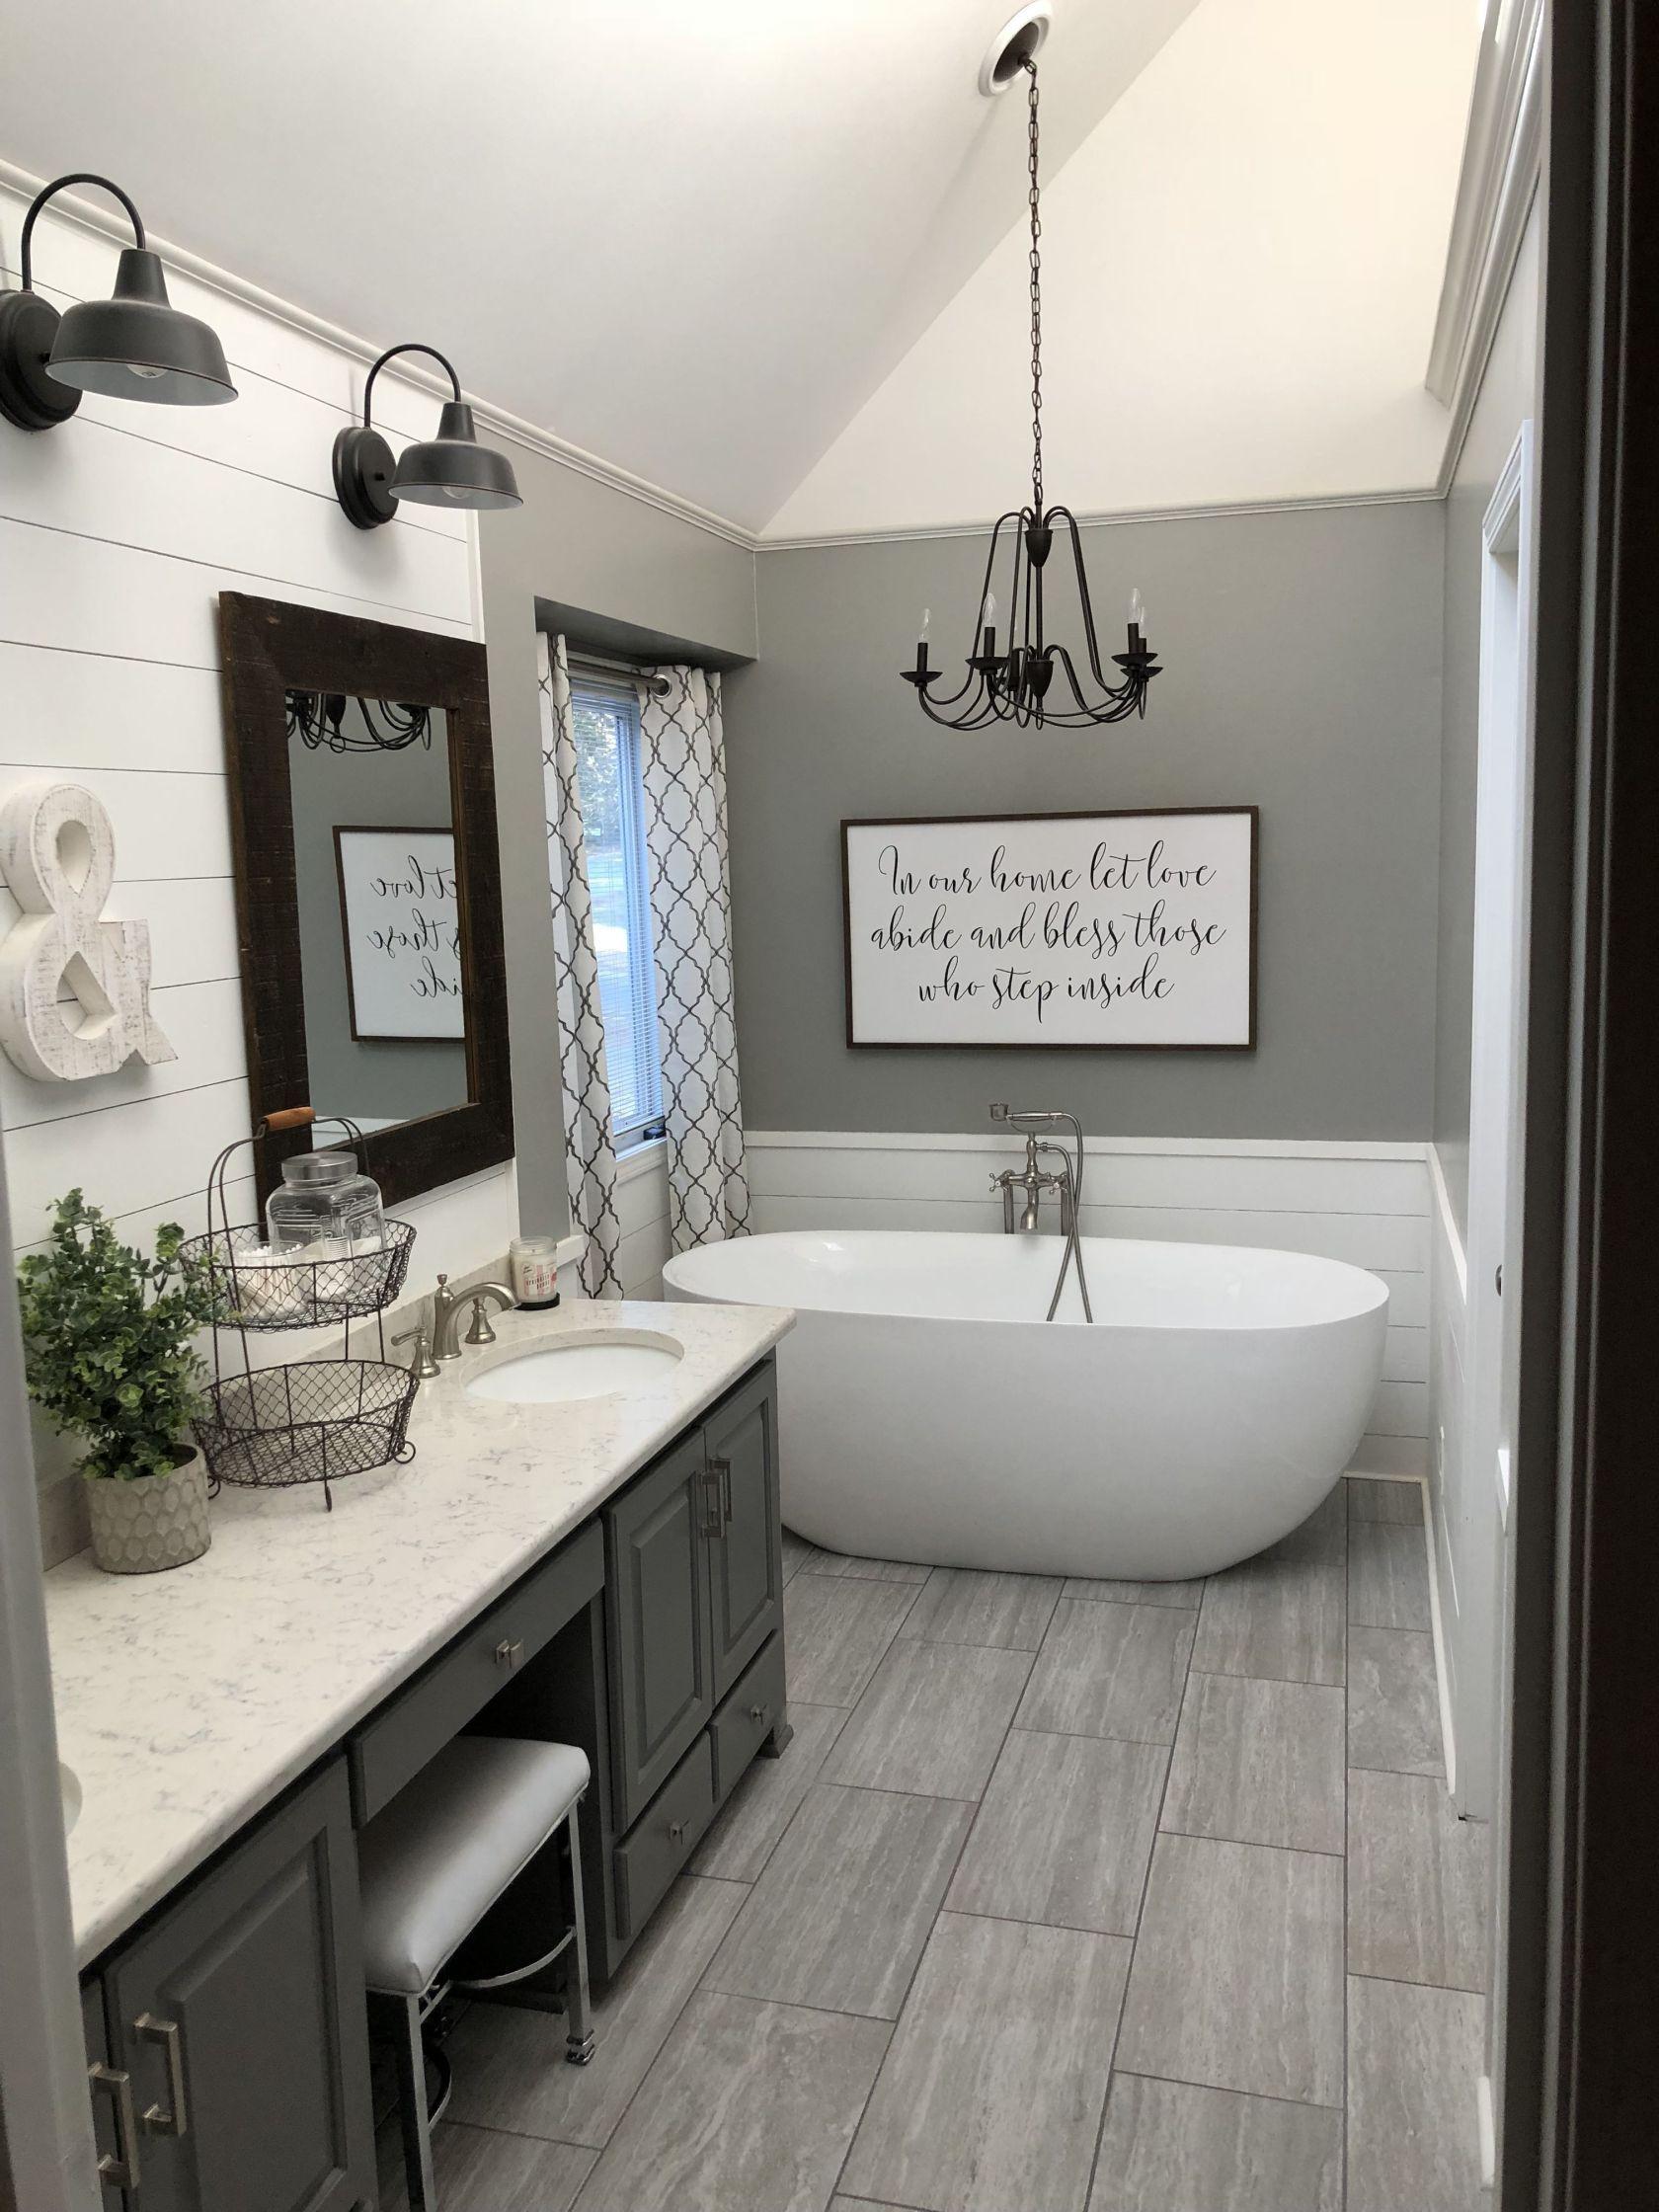 Miraculous Gray Master Bathroom Ideas Greybathroomideas Masterbathroomideas Bathroomtilei Bathroom Remodel Master Bathrooms Remodel Farmhouse Bathroom Decor